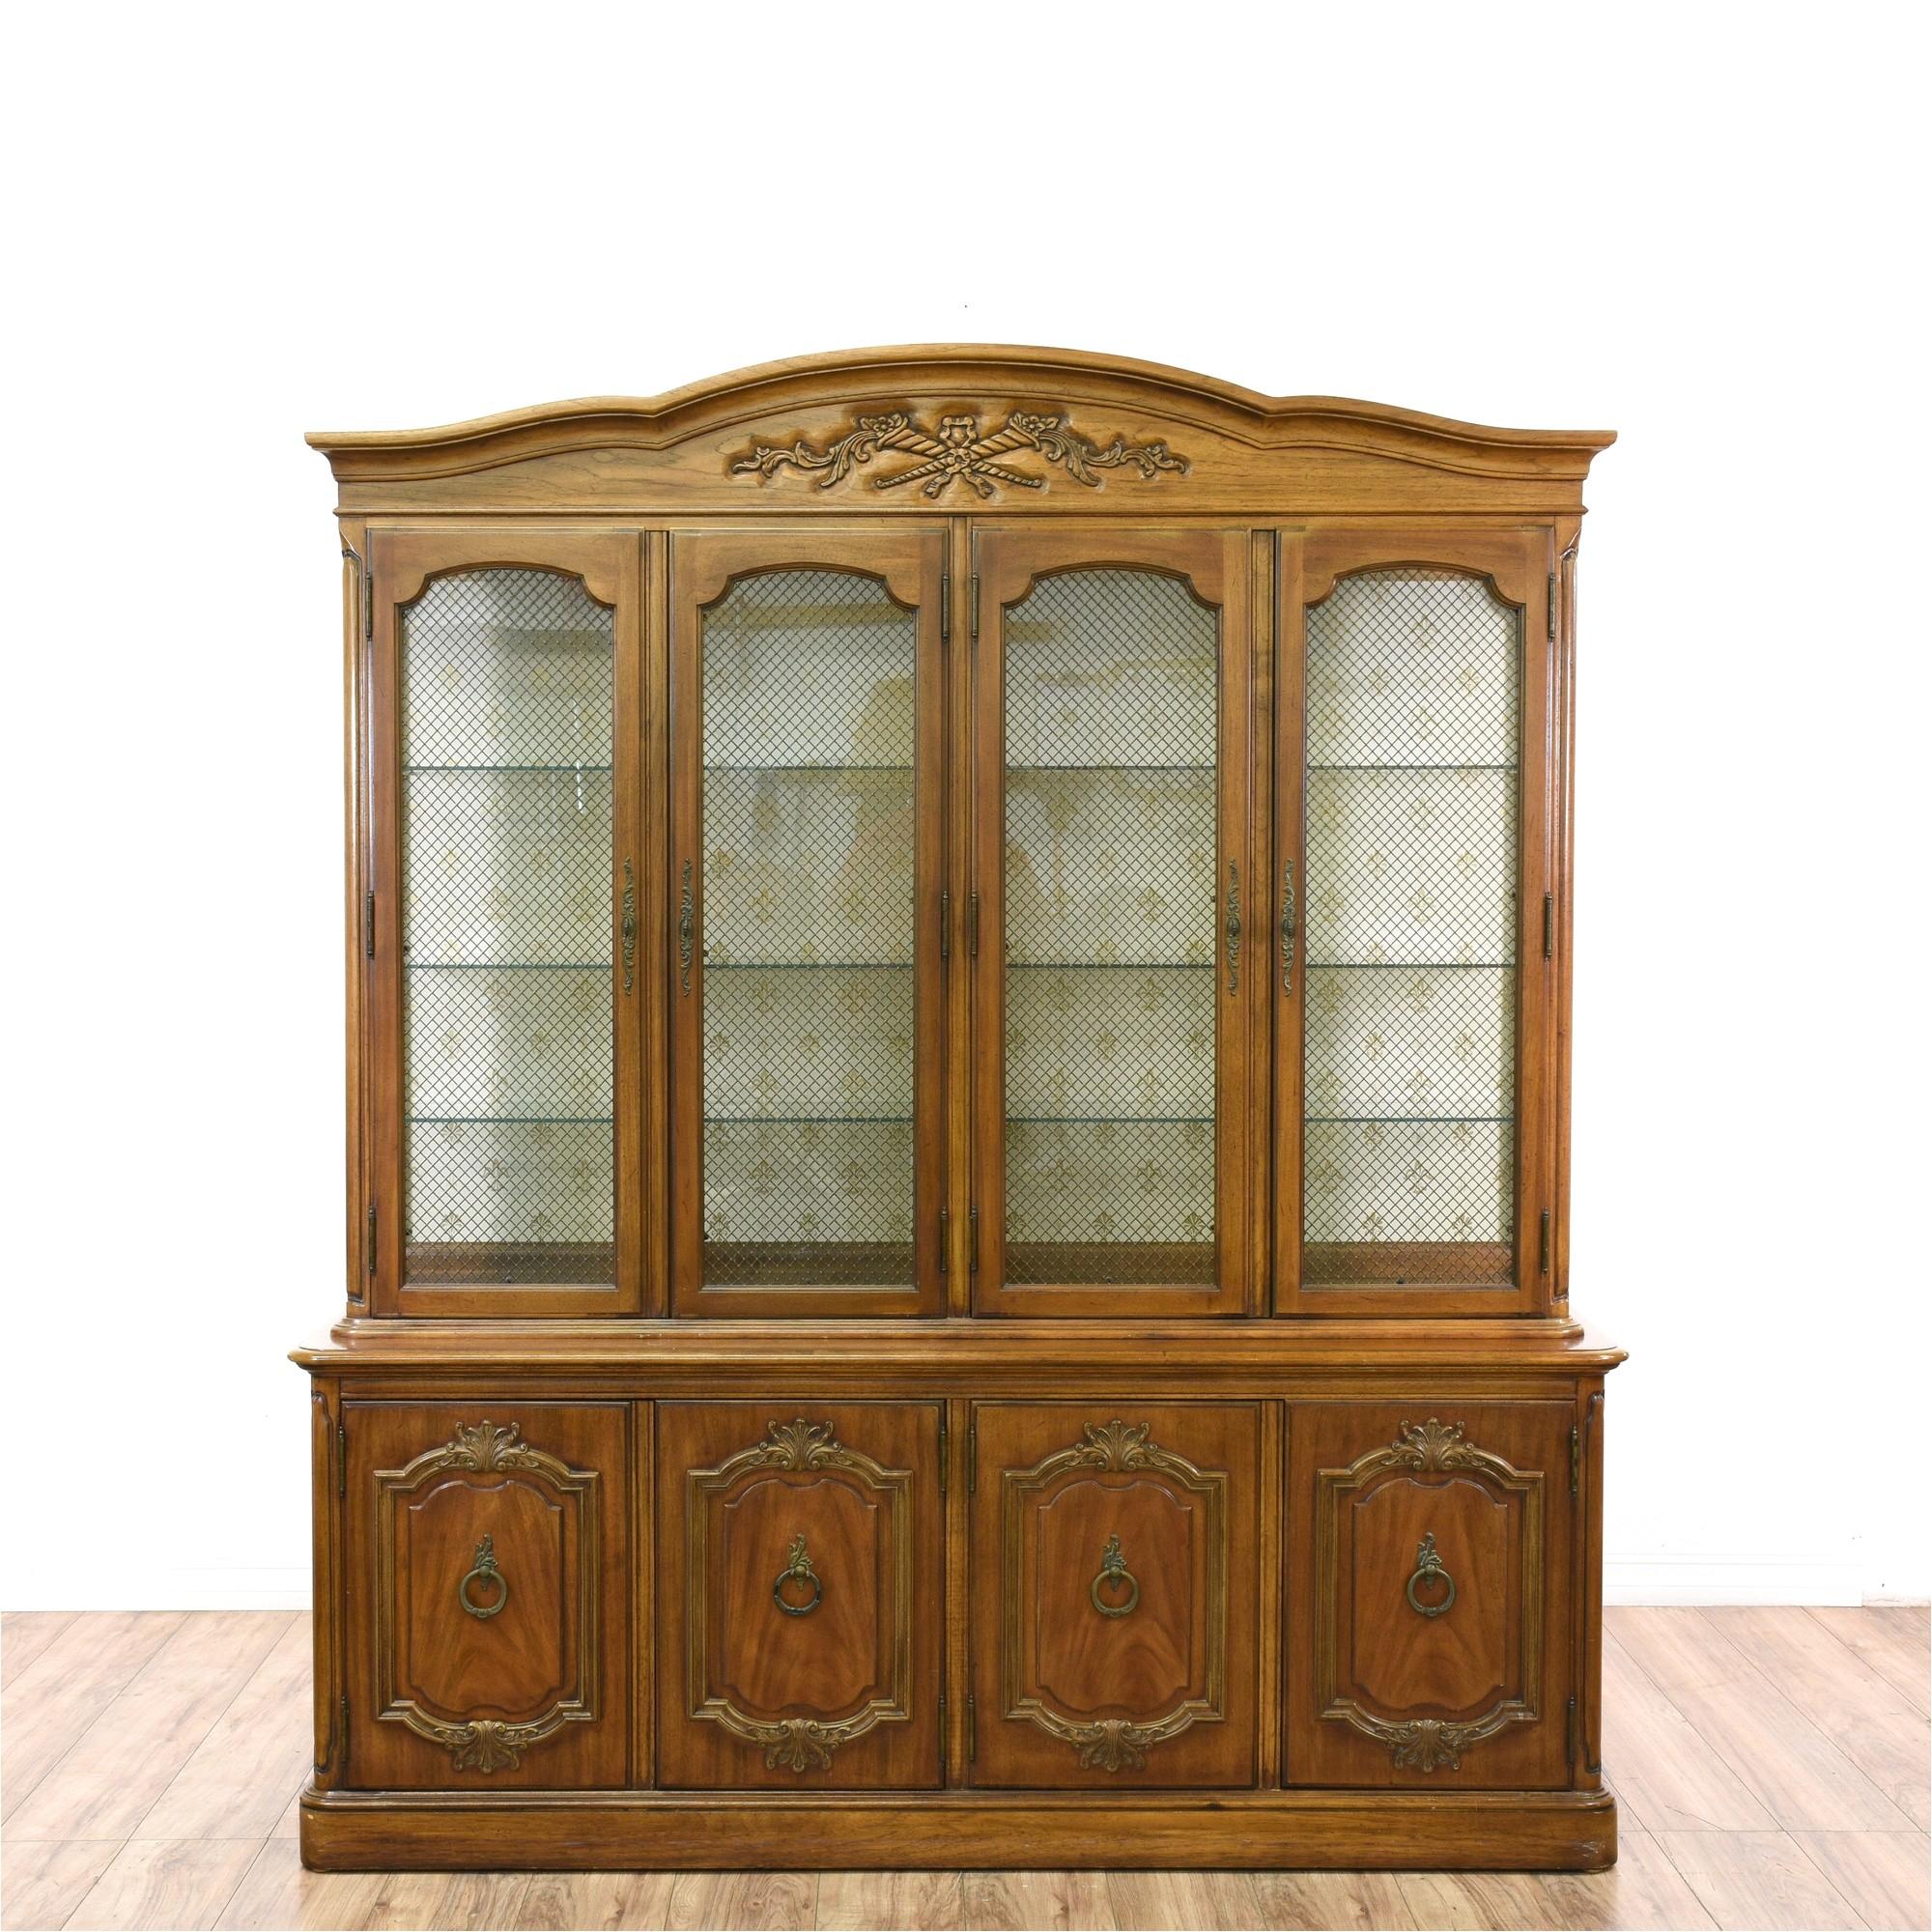 thomasville carved oak china cabinet display loveseat vintage furniture san diego